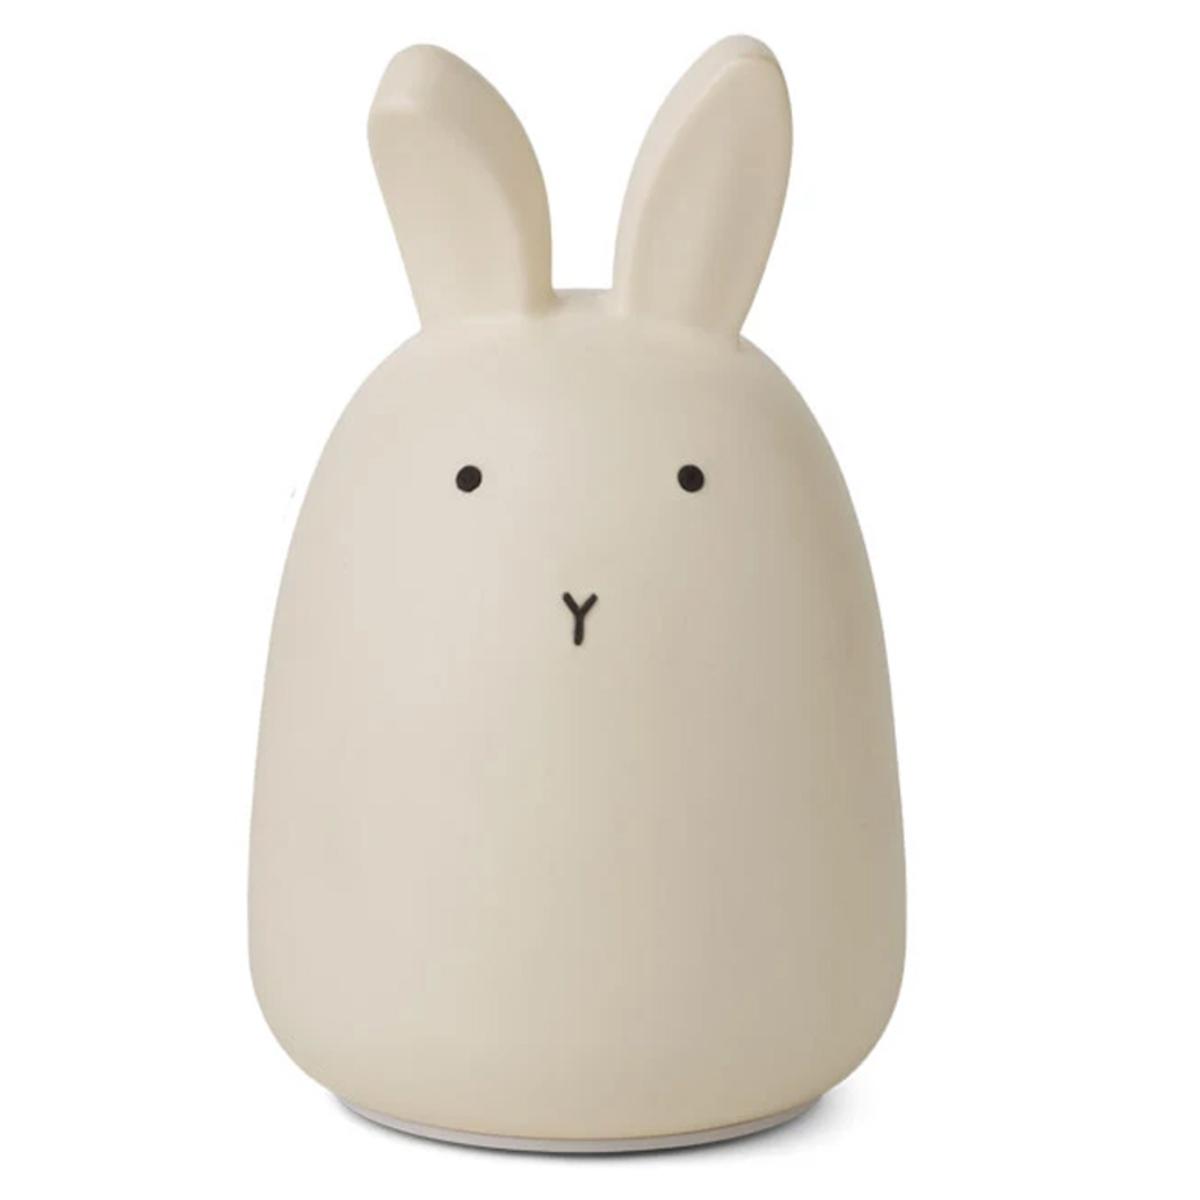 Veilleuse Veilleuse Winston - Rabbit Crème de la Crème Veilleuse Winston - Rabbit Crème de la Crème